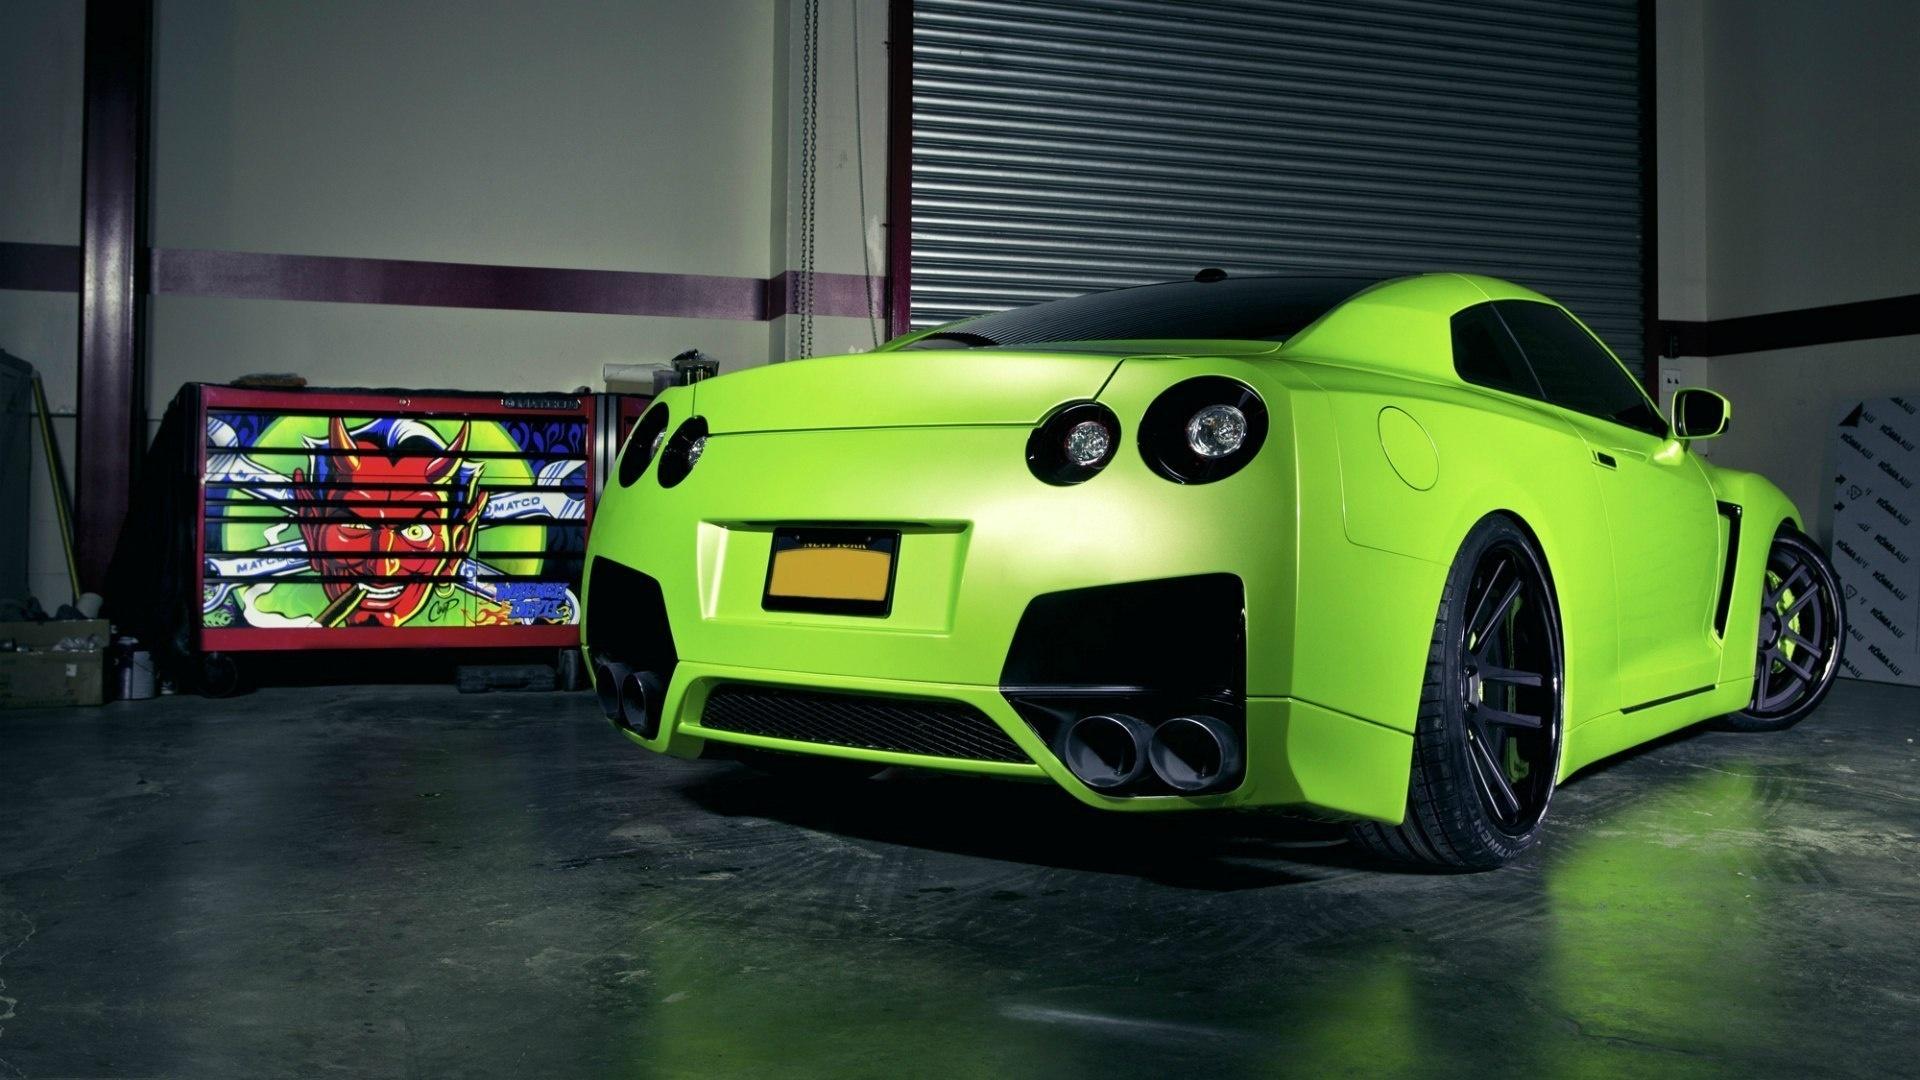 Green GTR